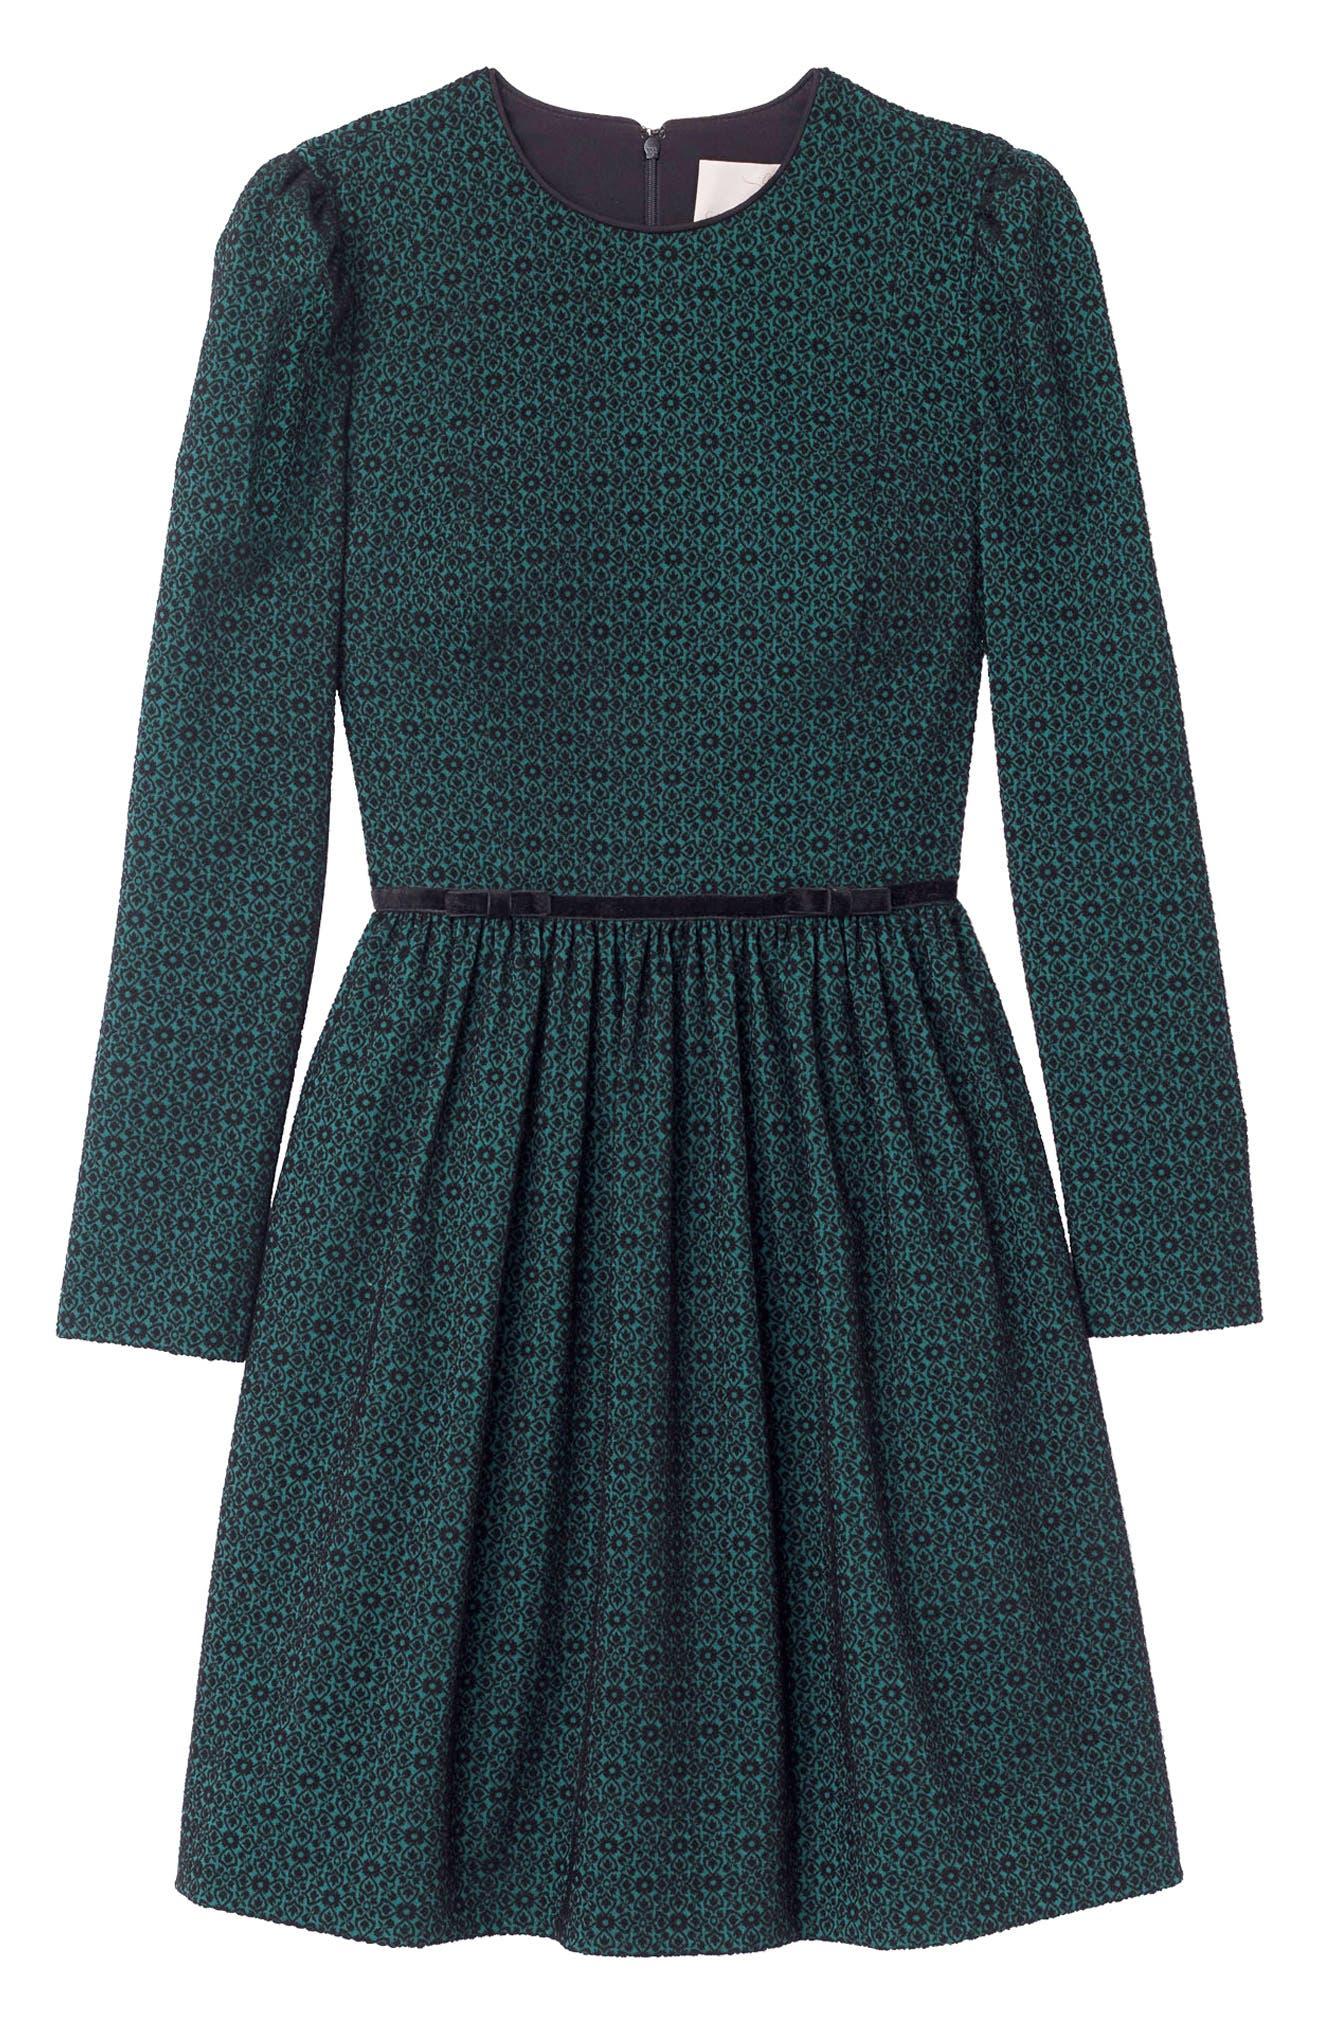 Callie Print Long Sleeve Dress,                             Alternate thumbnail 4, color,                             300